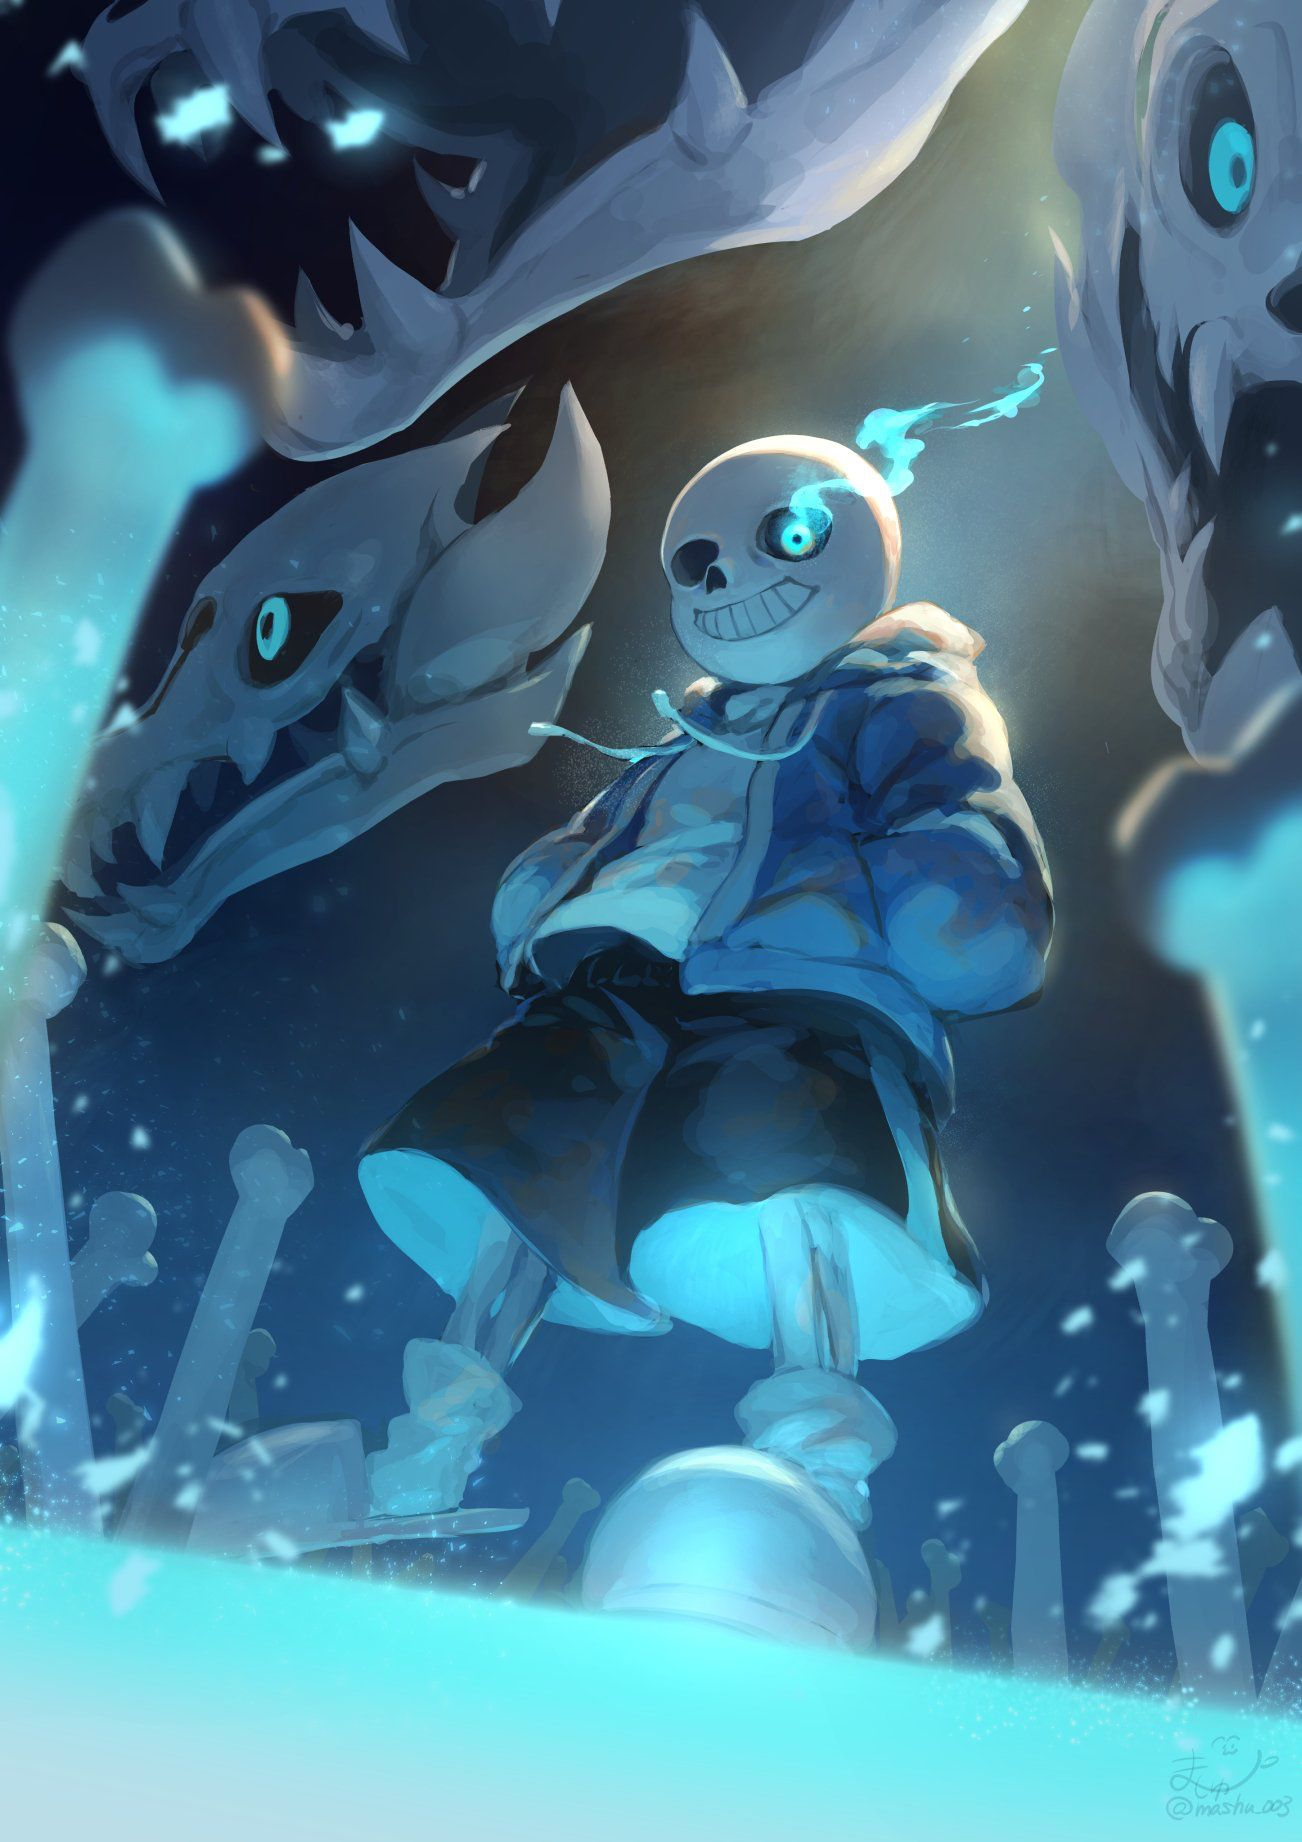 Épinglé par Muzaffer Kök sur Anime Dessin manga, Fond d